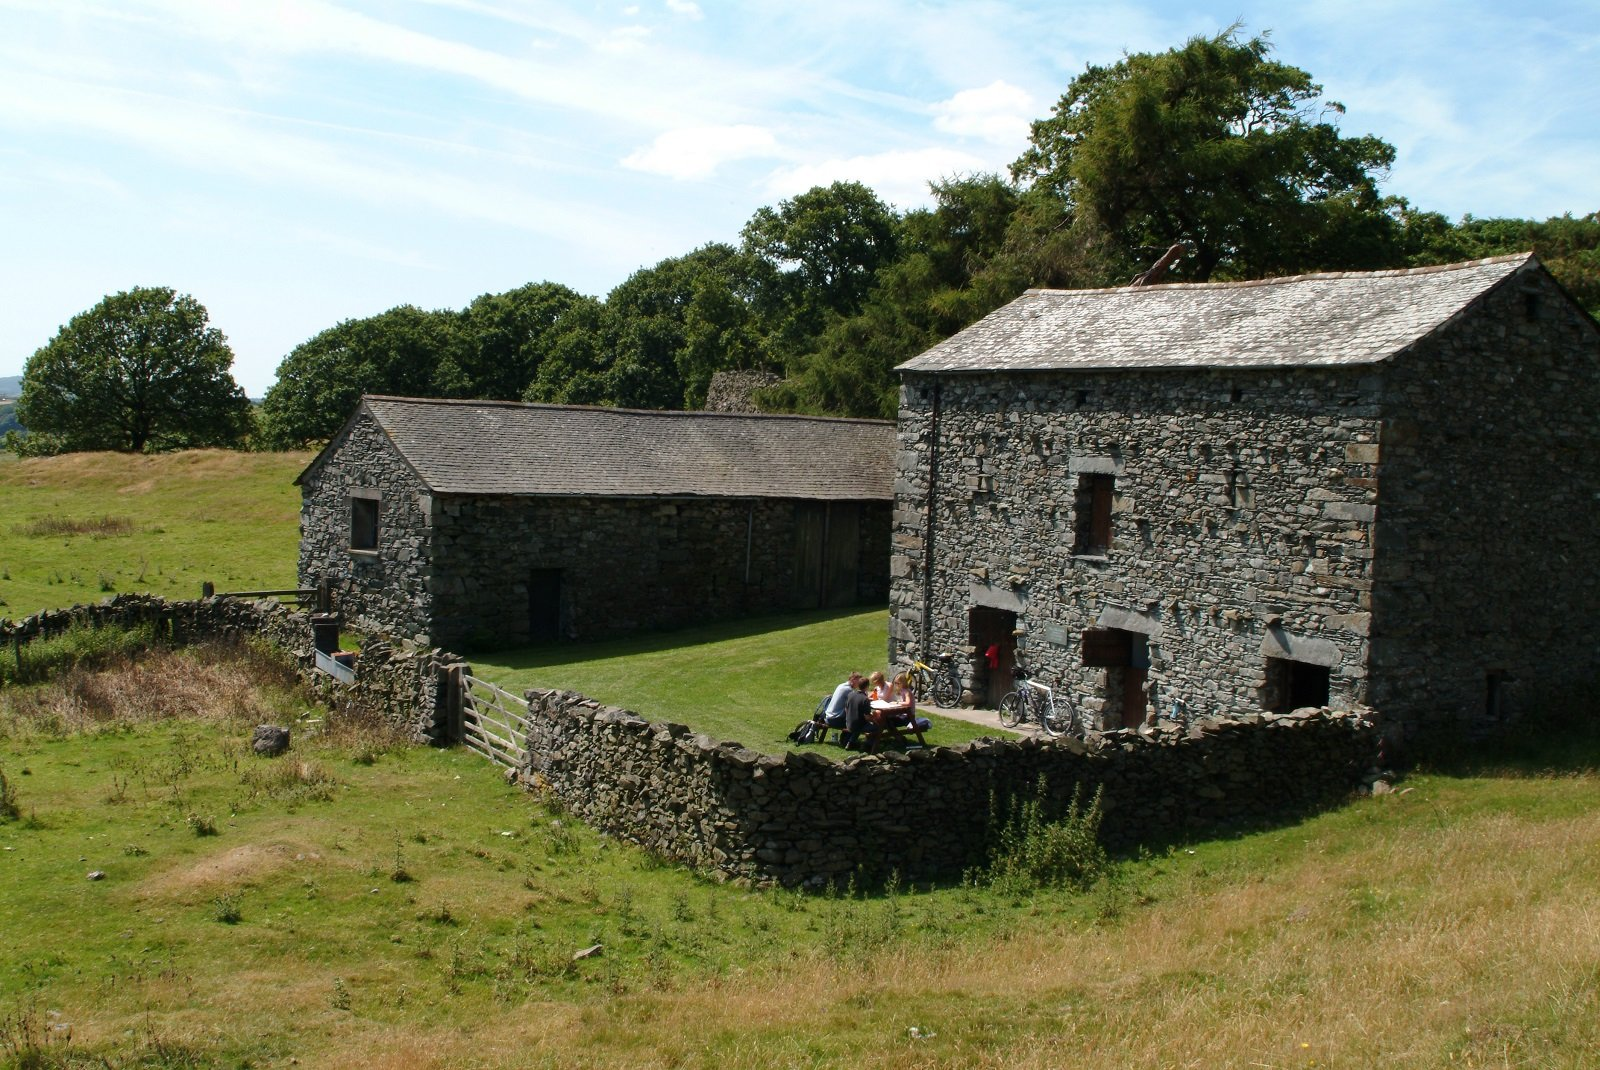 Lake District Camping Barn